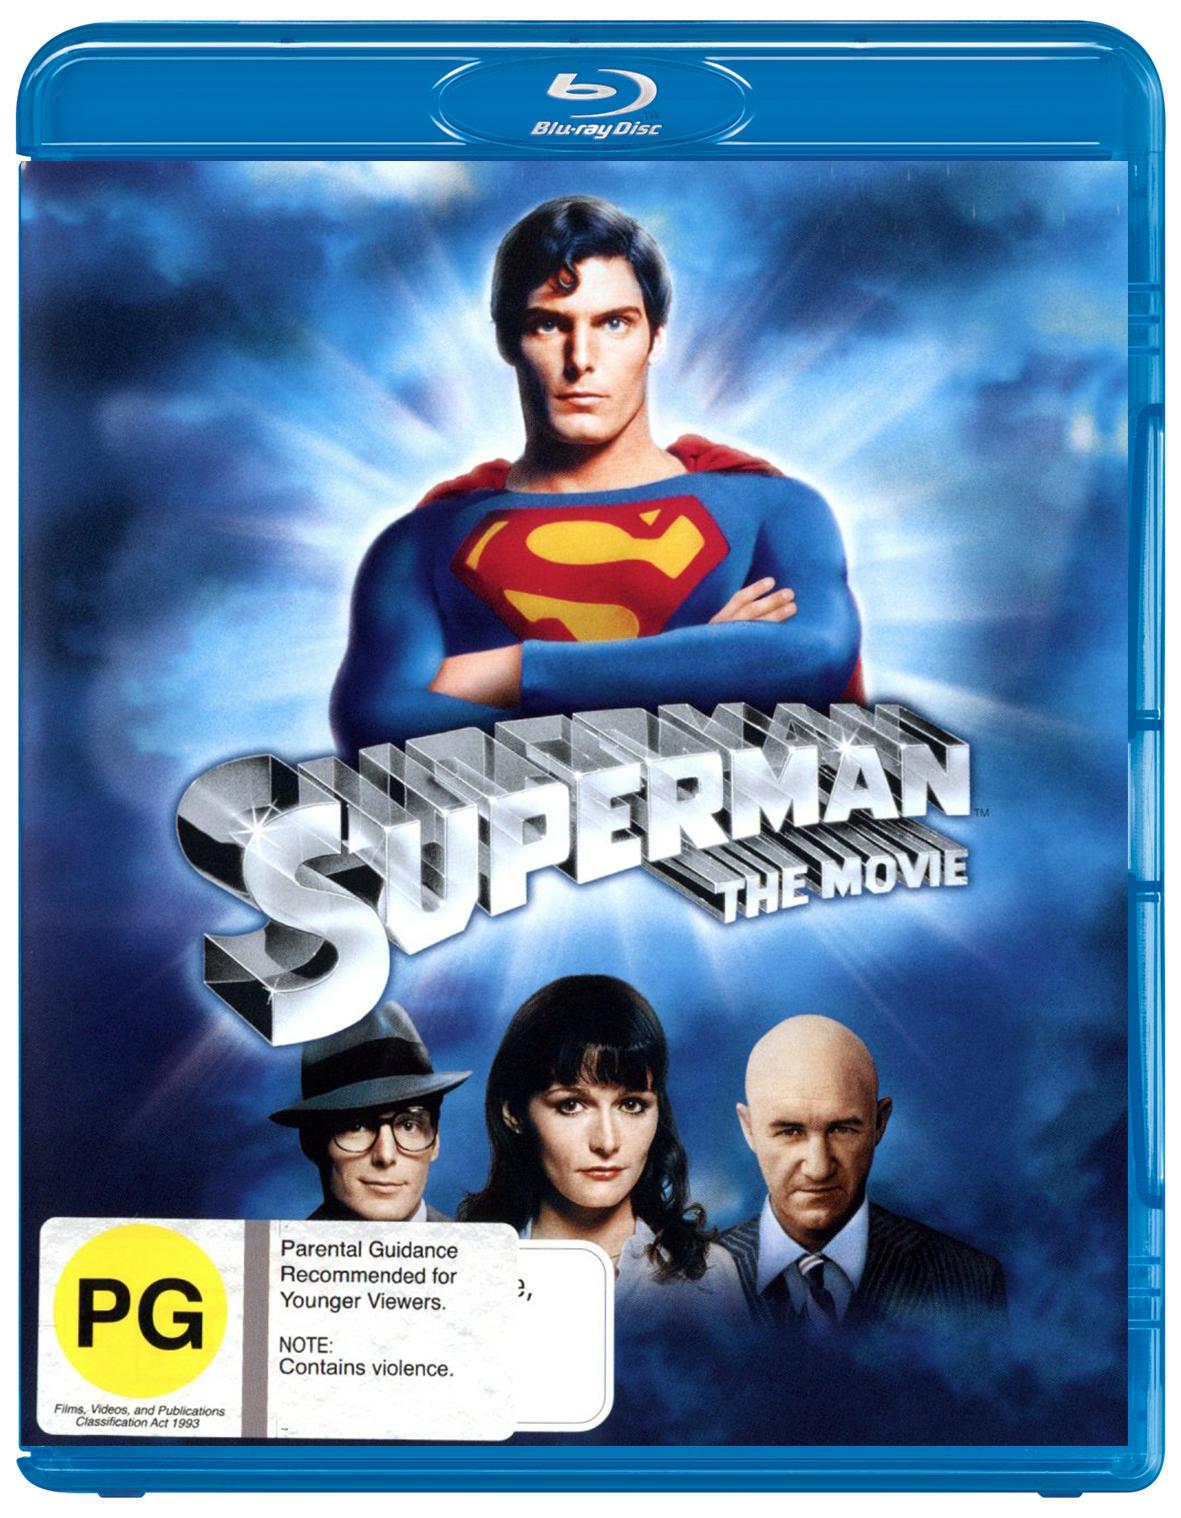 Superman - The Movie on Blu-ray image